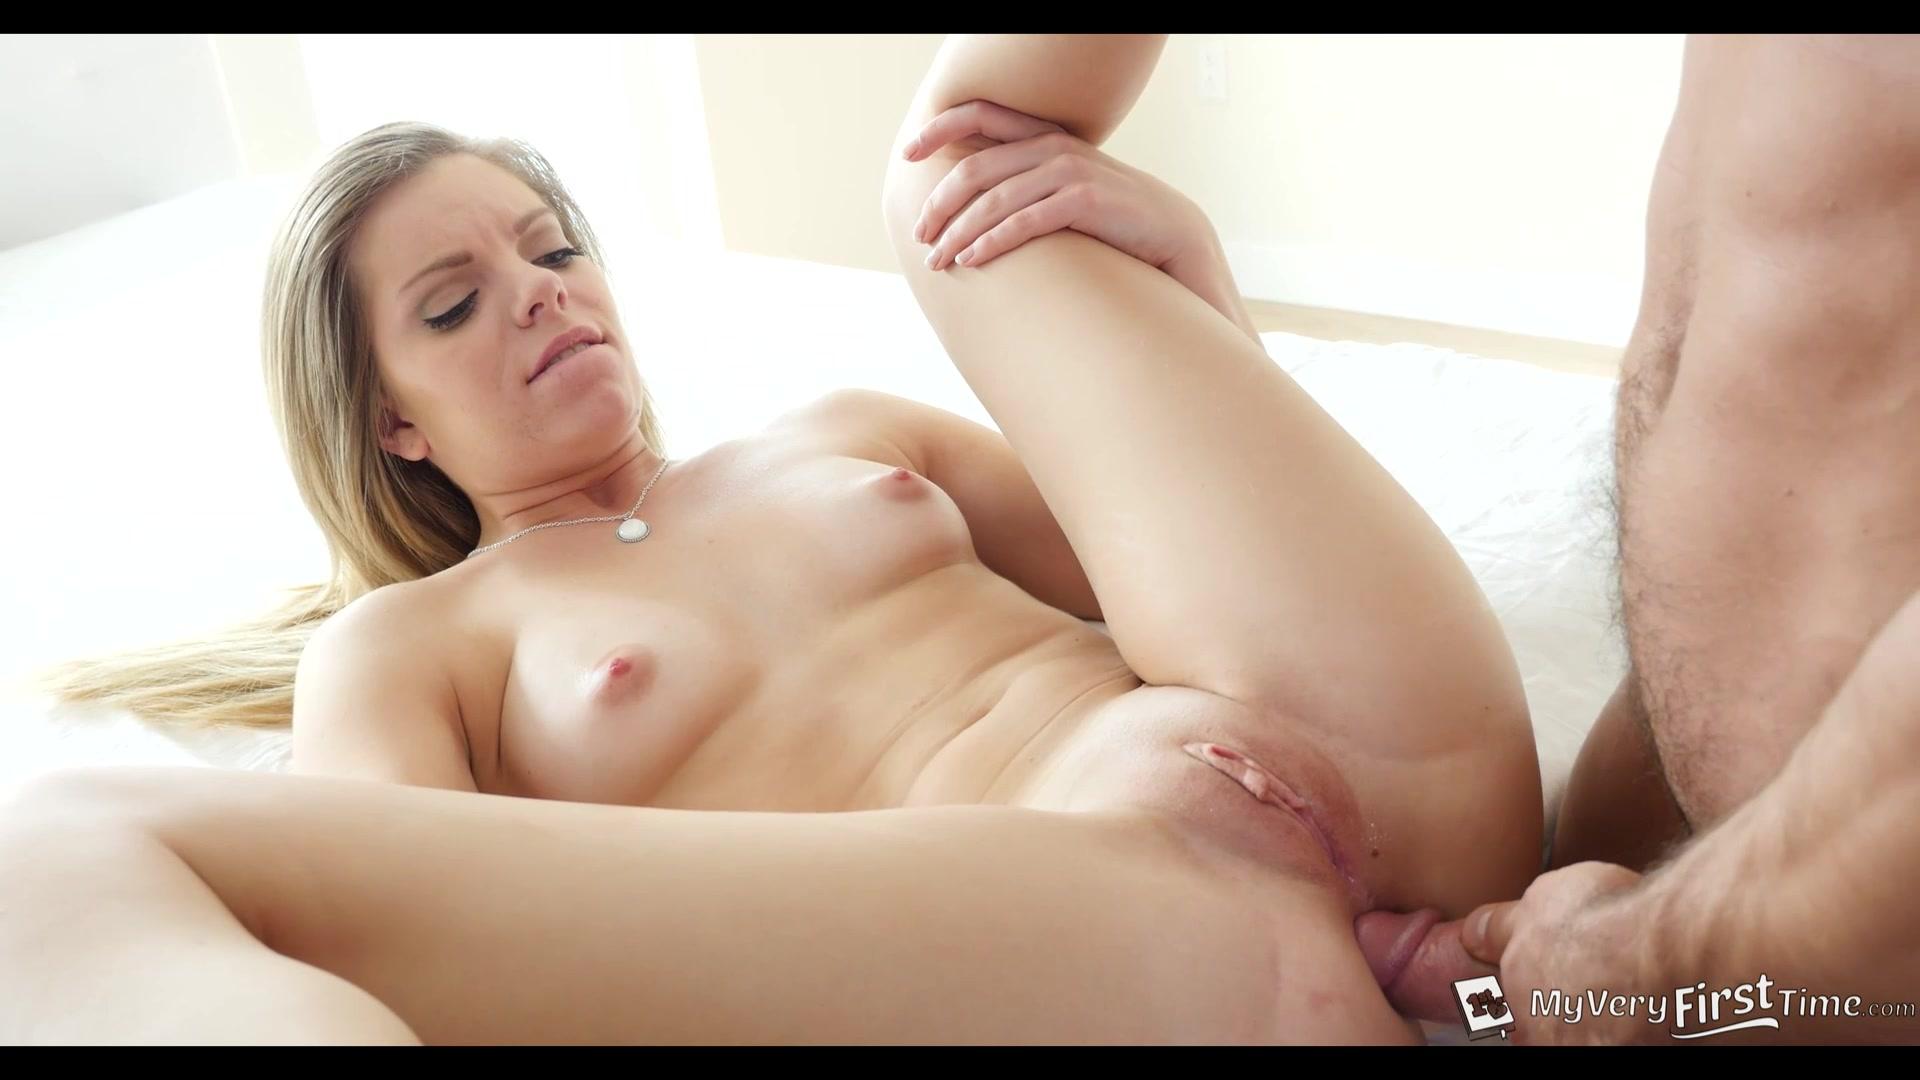 Lesbian pantyhose story